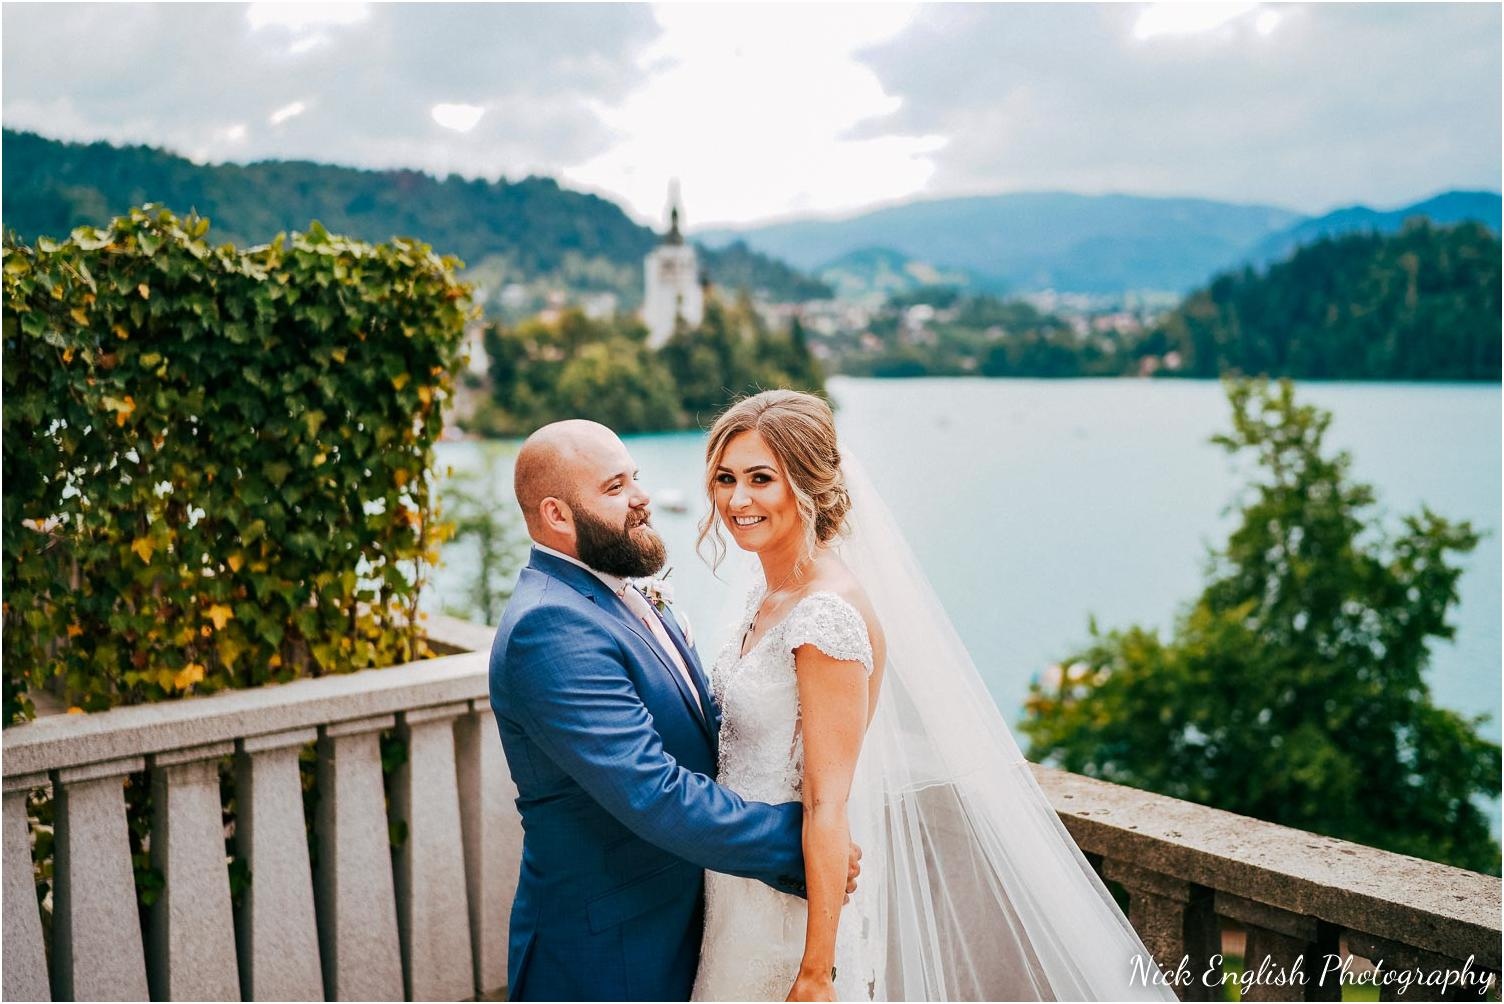 Destination_Wedding_Photographer_Slovenia_Nick_English_Photography-59.jpg